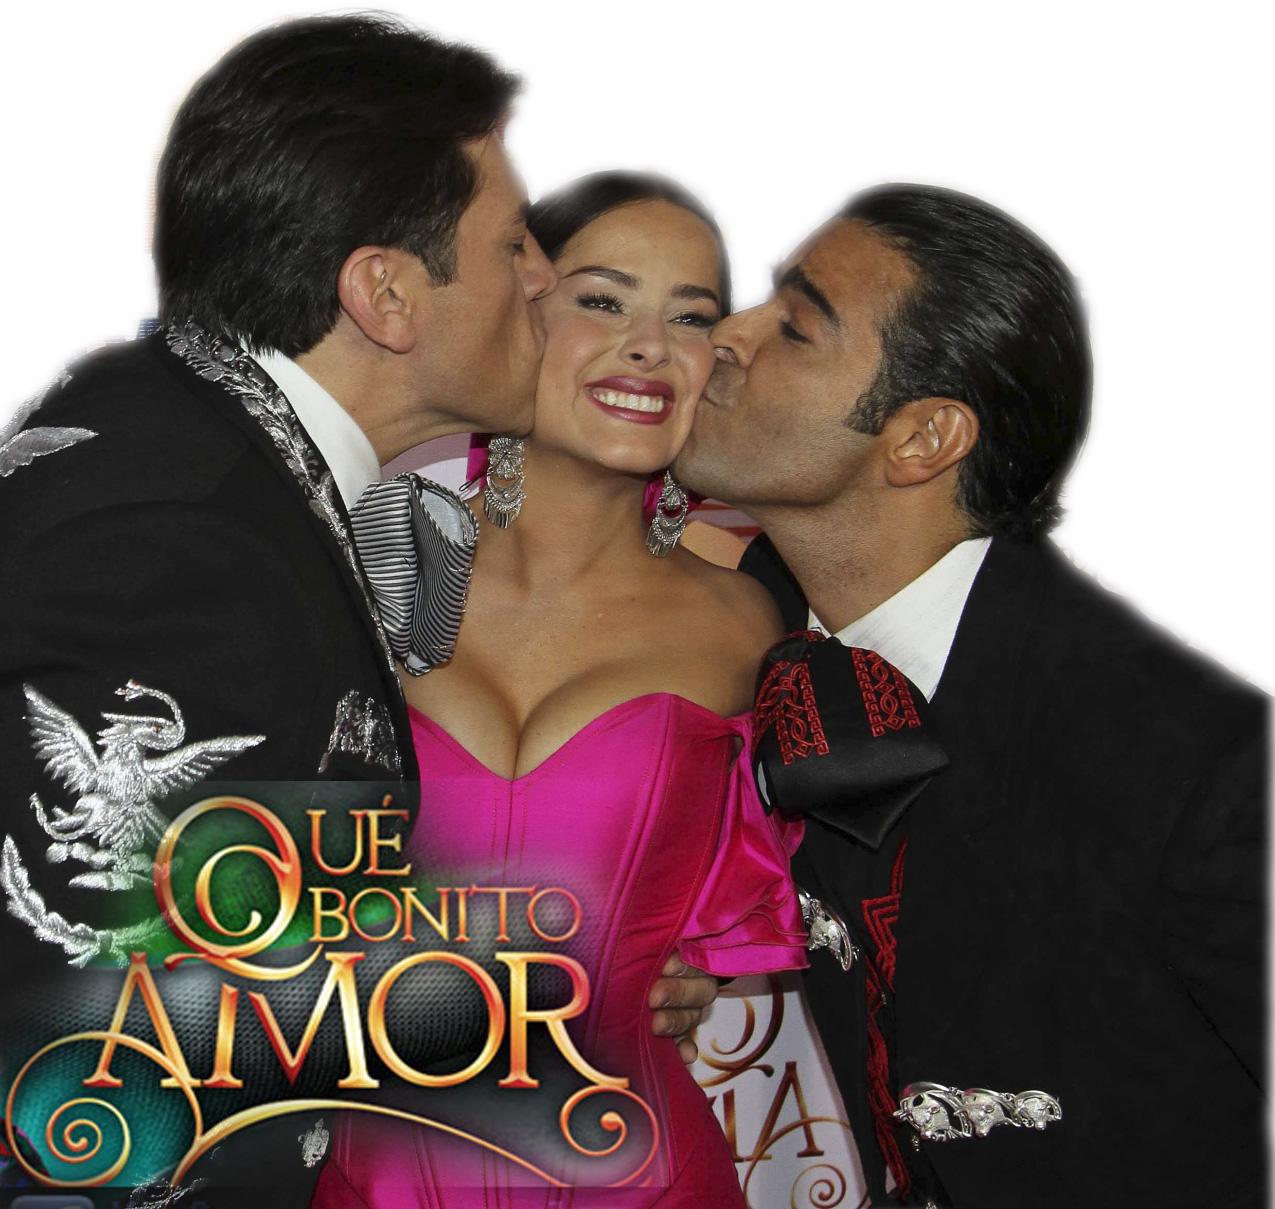 Que Bonito Amor Televisa 2013 Tv Novelas Bg